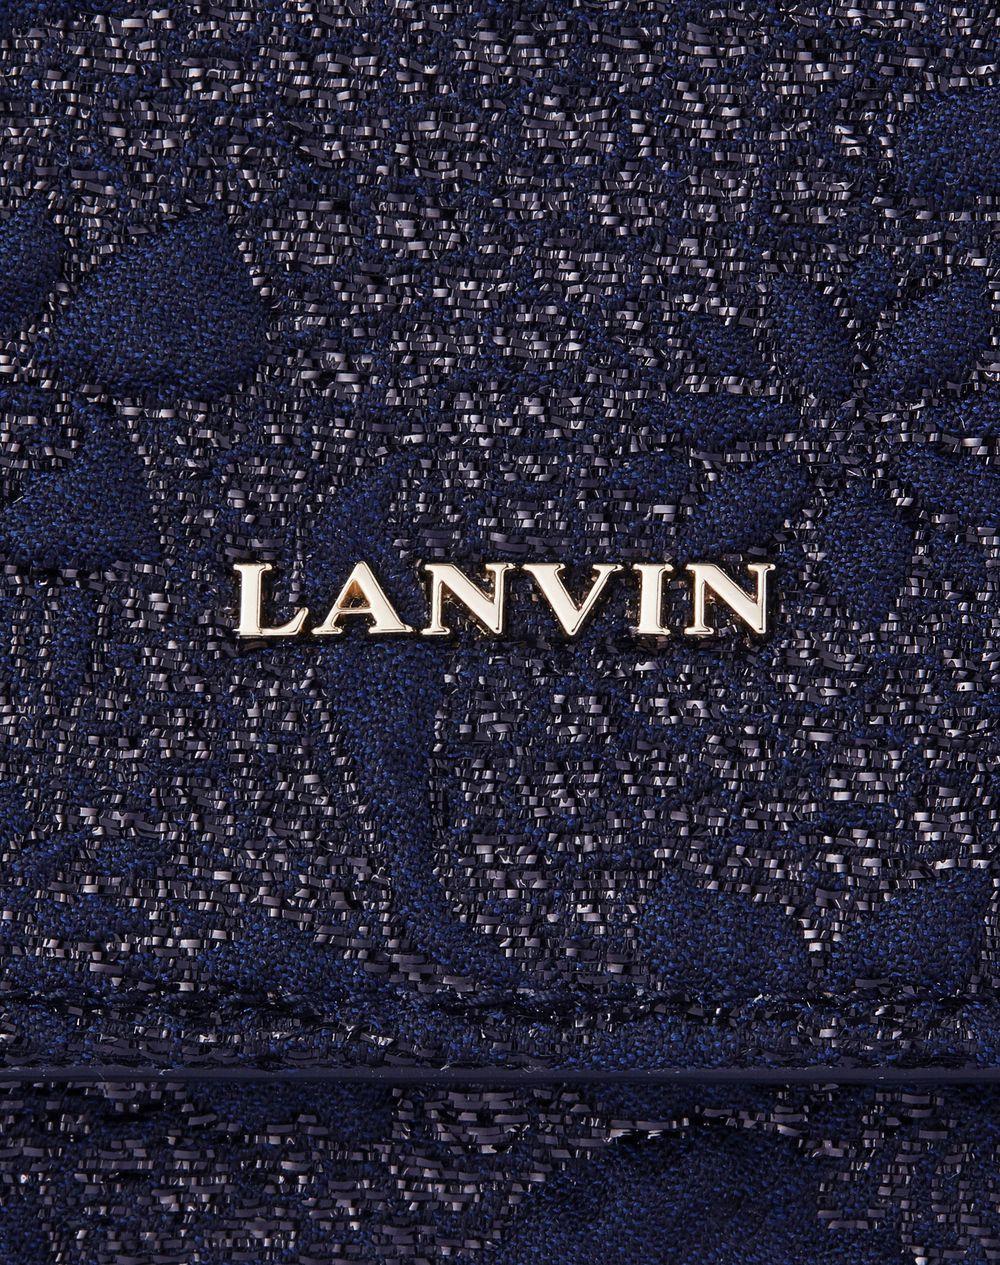 FLAP CLUTCH - Lanvin